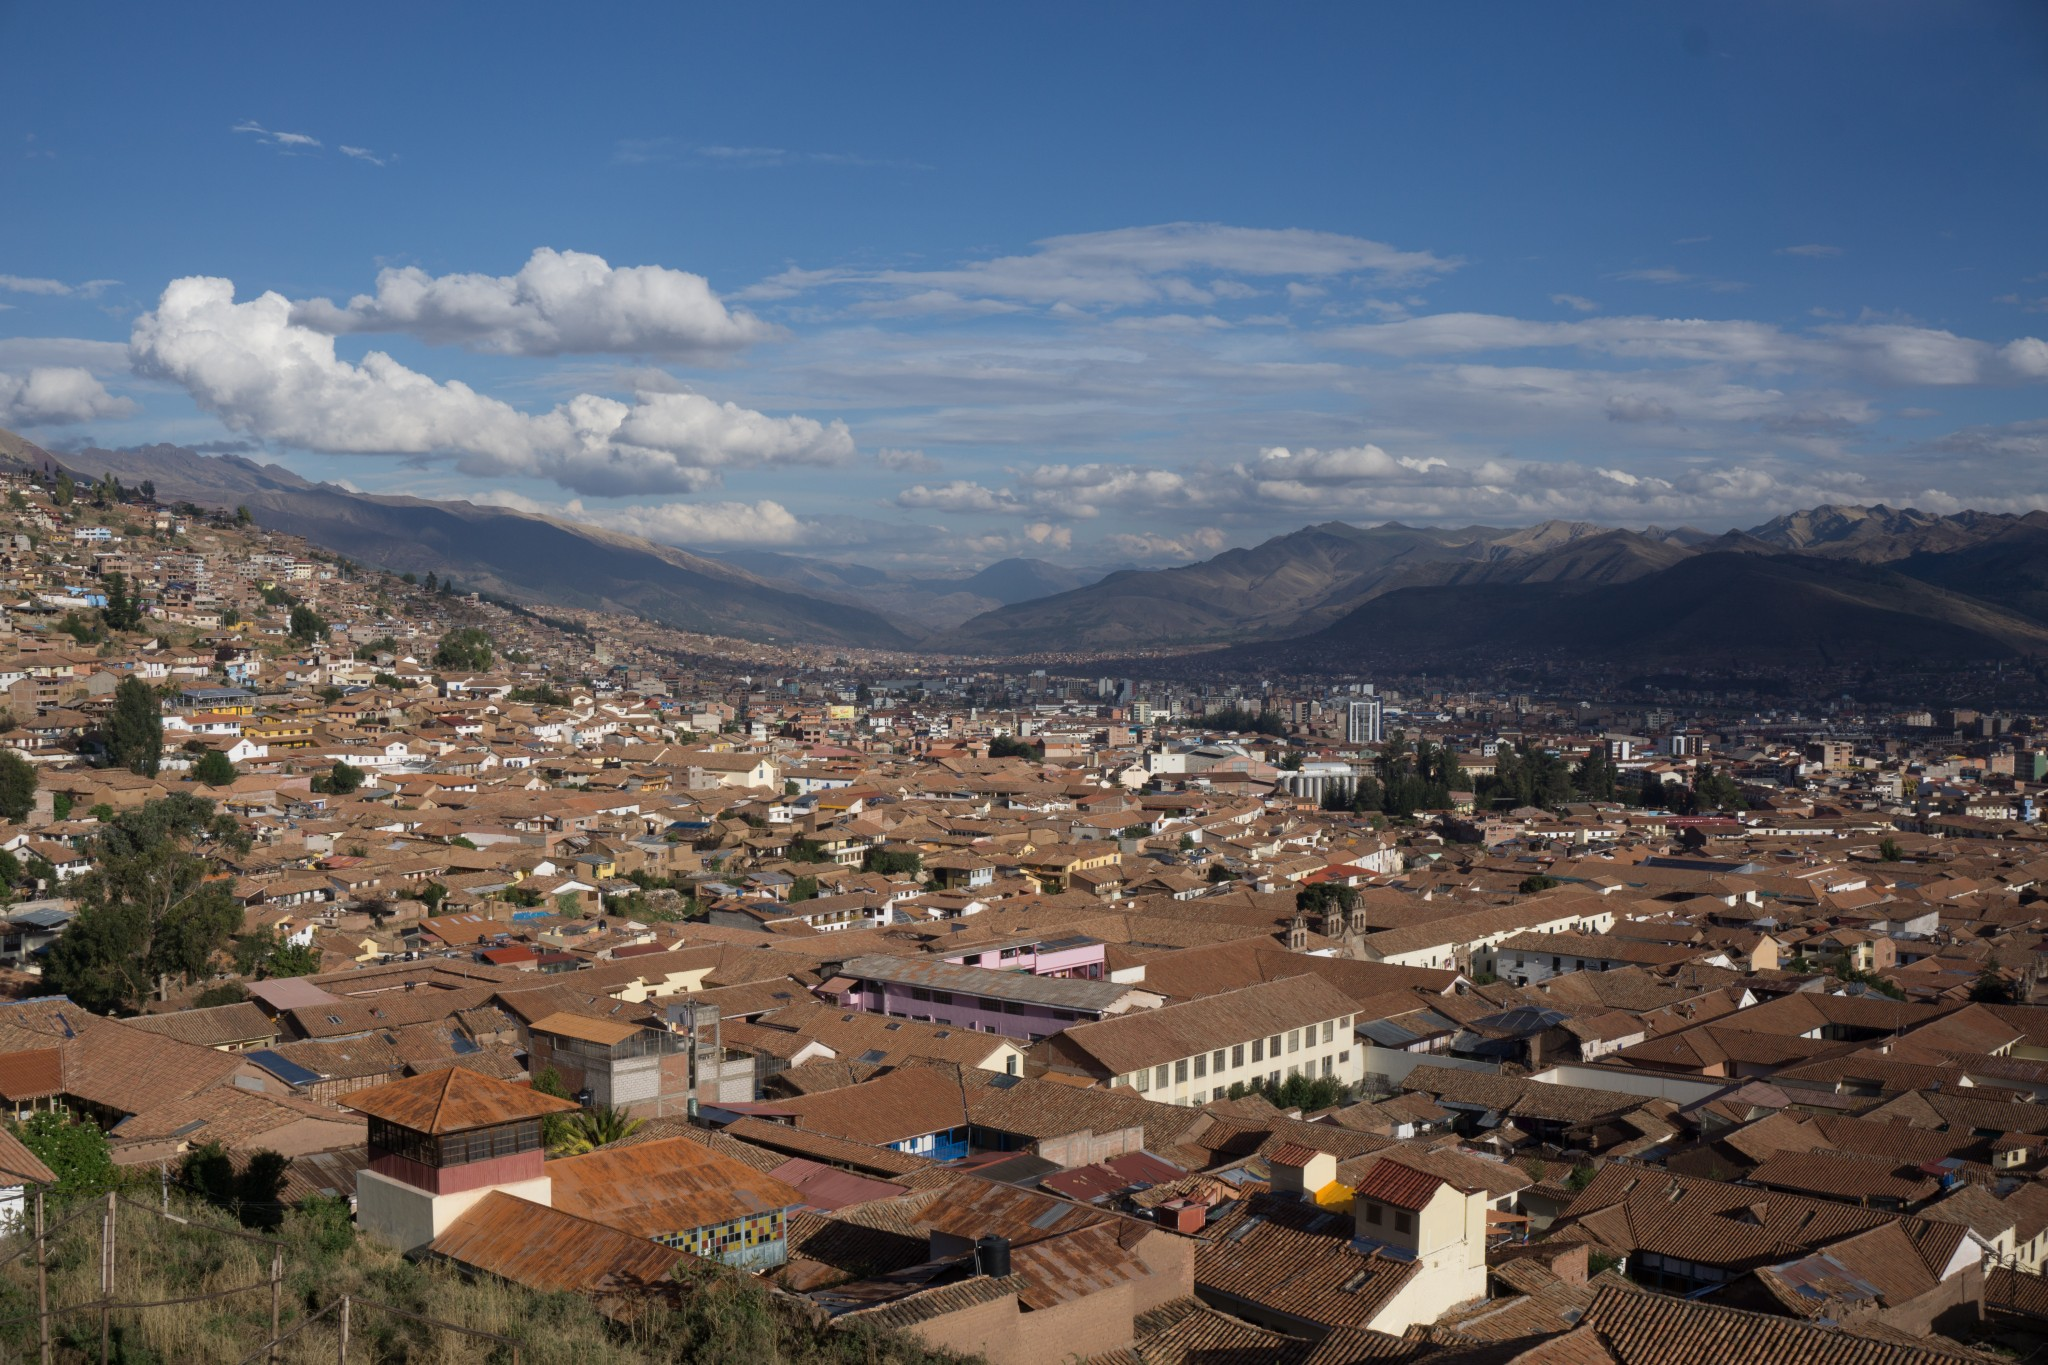 Cuzco City, Peru